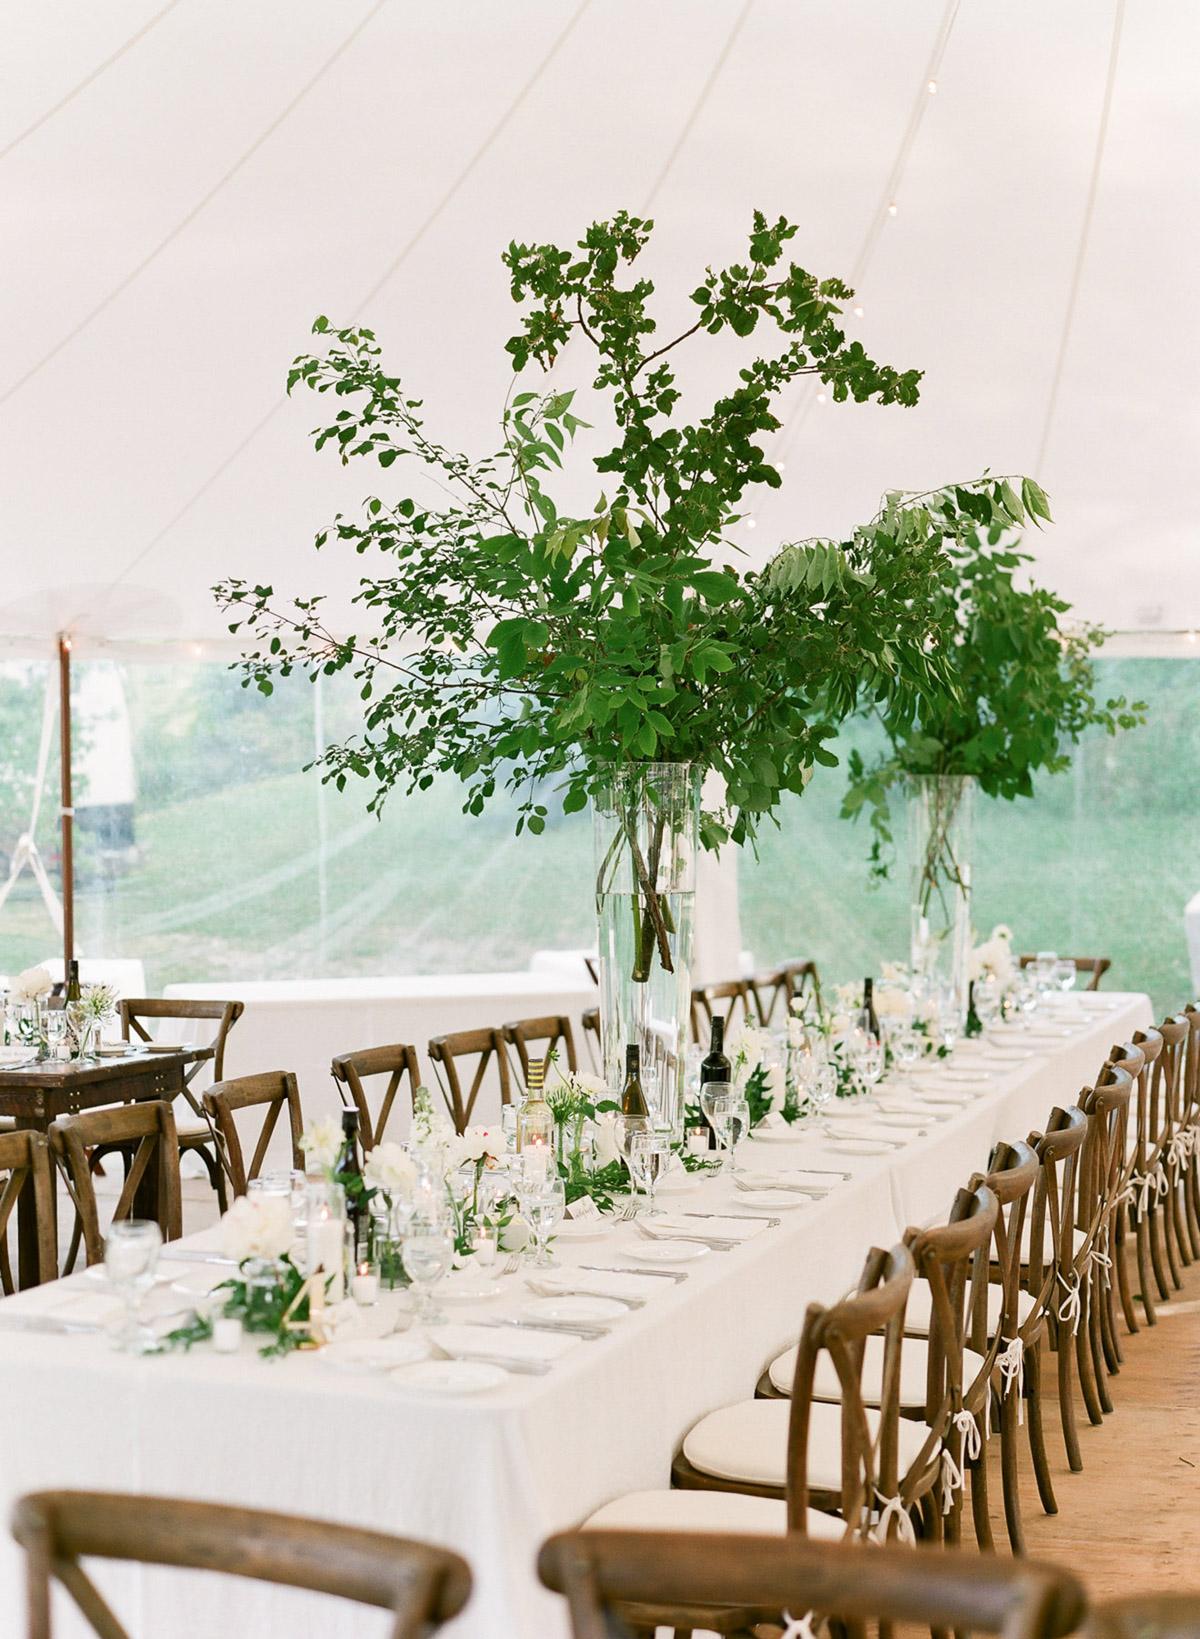 artiese-studios-vineyard-bride-swish-list-private-estate-cambridge-wedding-35.jpg